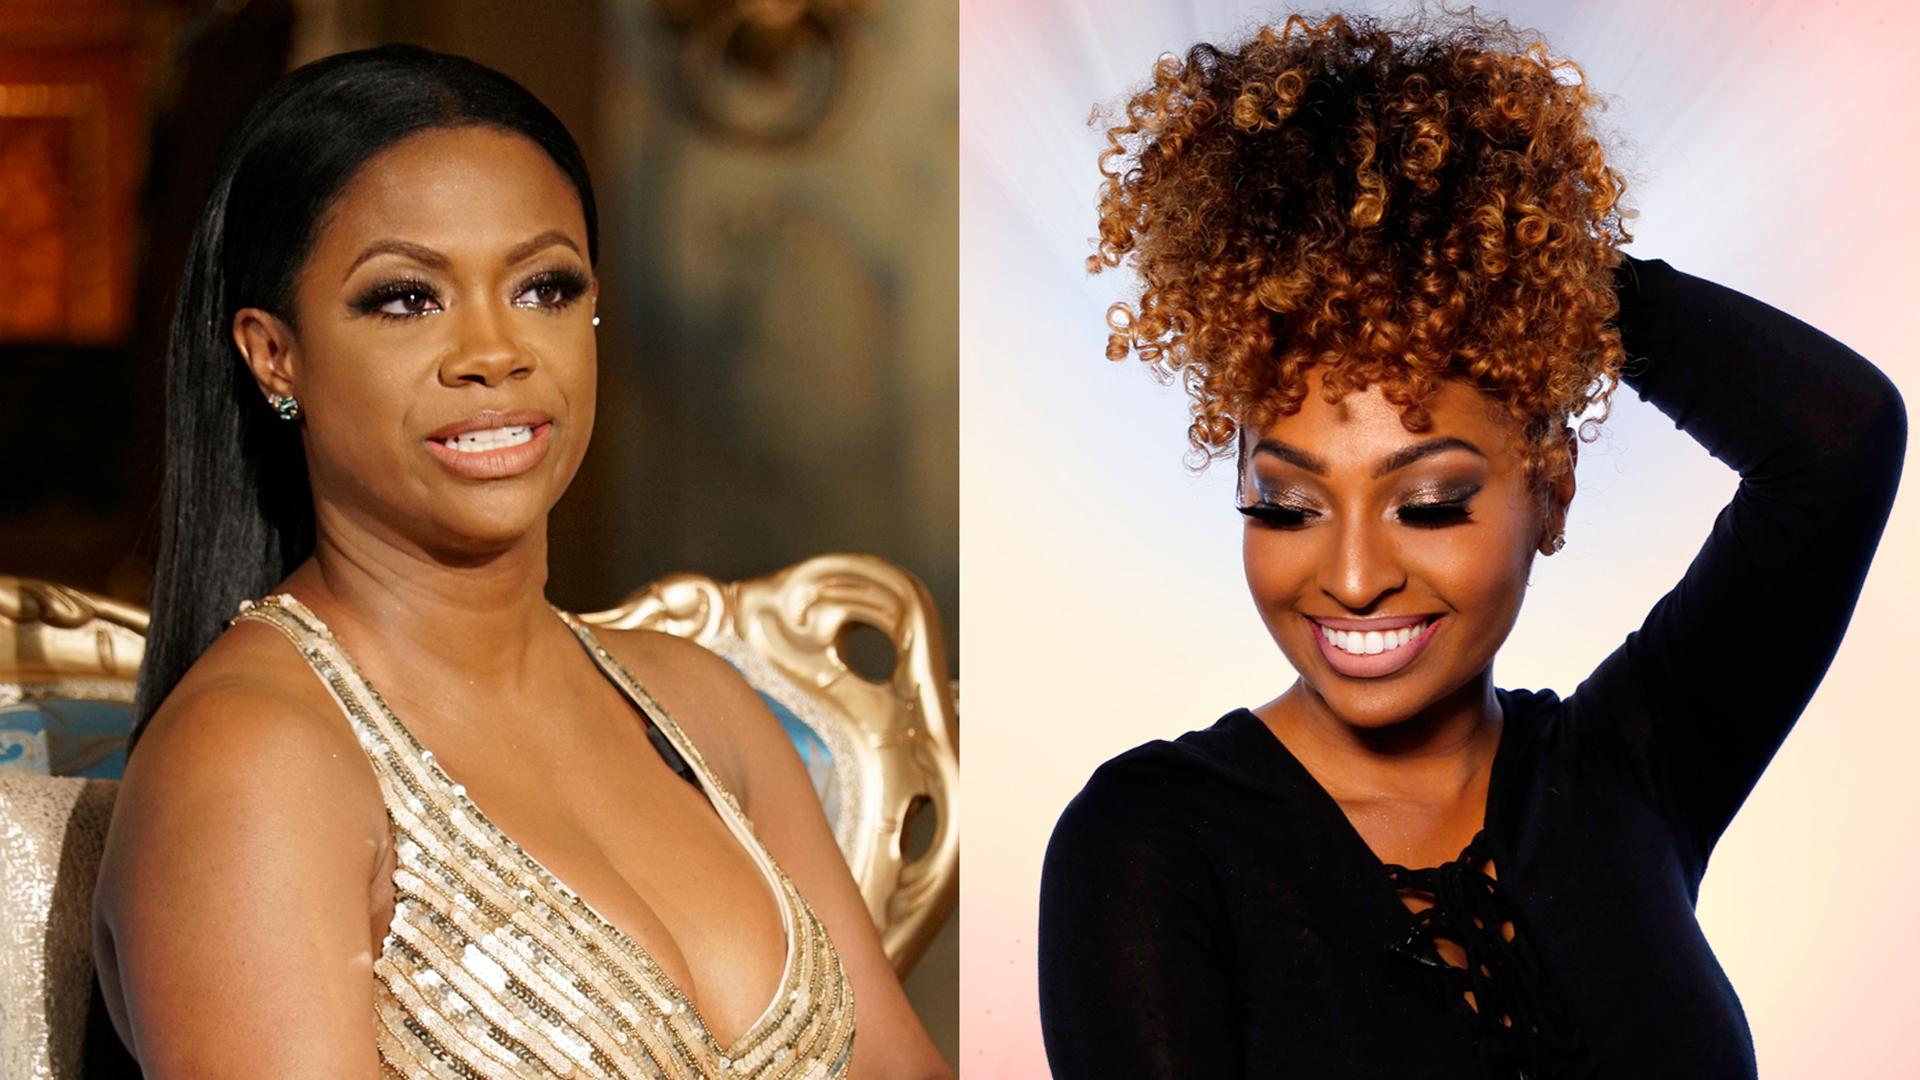 Kandi Burruss The Real Housewives Of Atlanta Reunion Beauty Lookbook